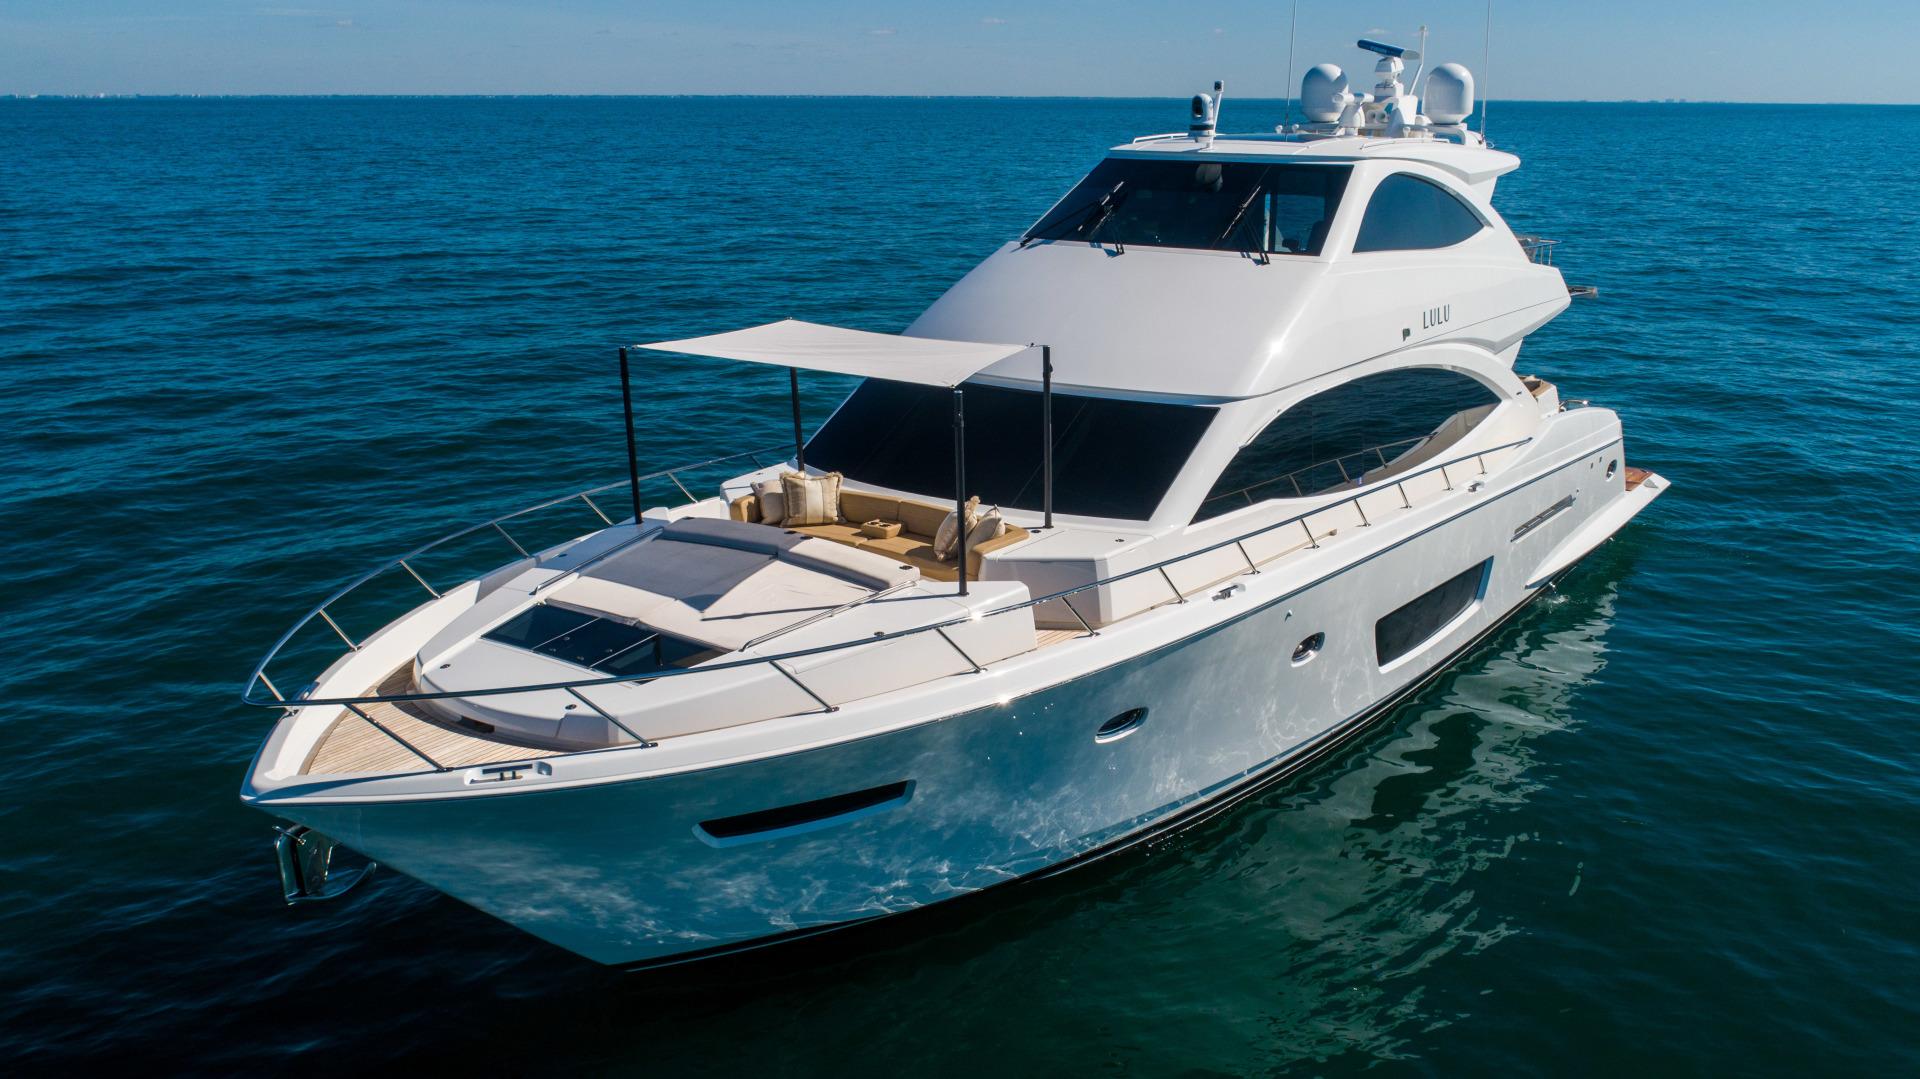 Viking-Motor Yacht 2018-LULU North Palm Beach-Florida-United States-LULU-1405960 | Thumbnail